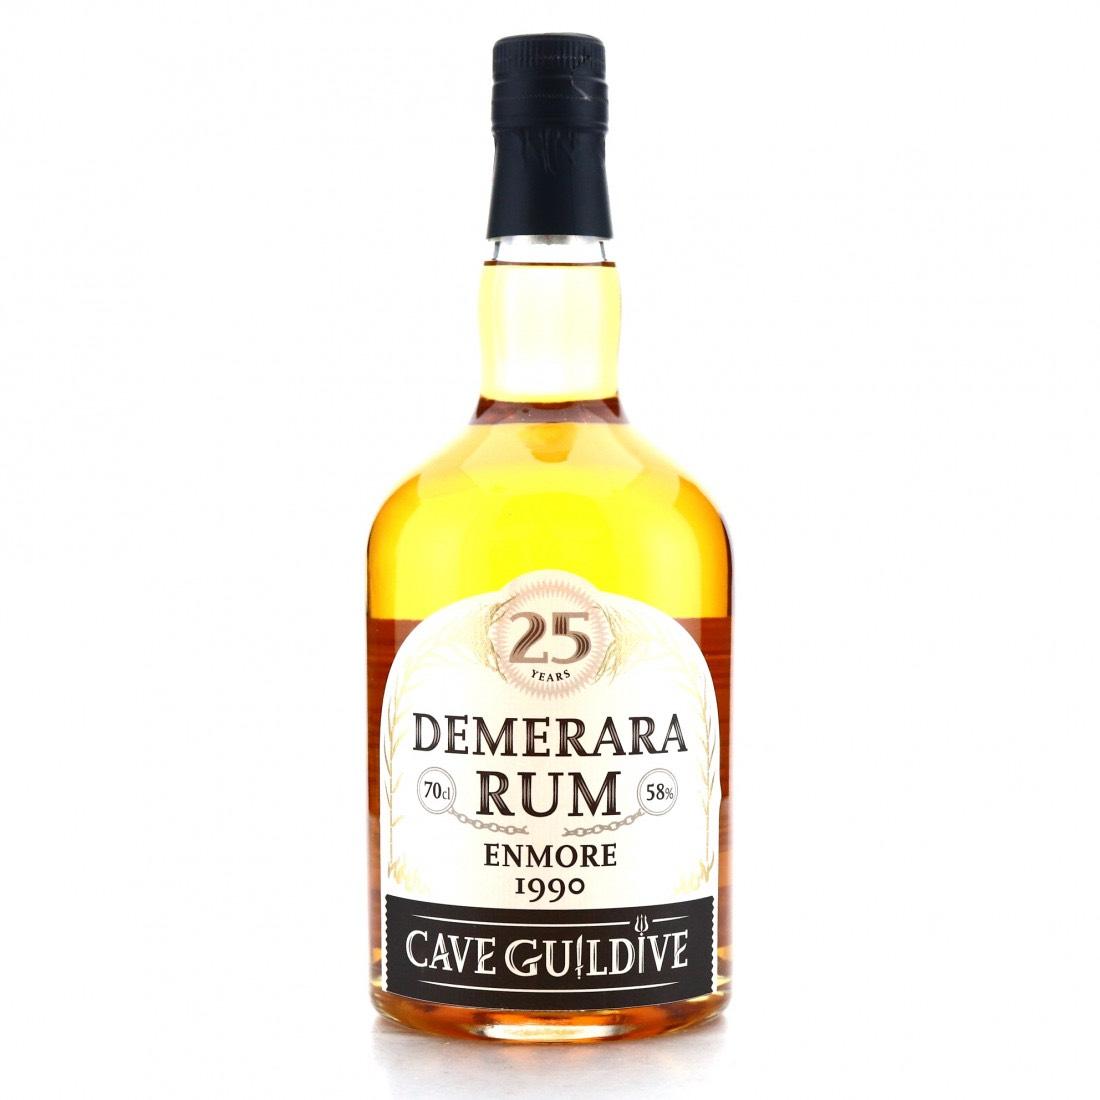 Bottle image of Demerara Rum MEV